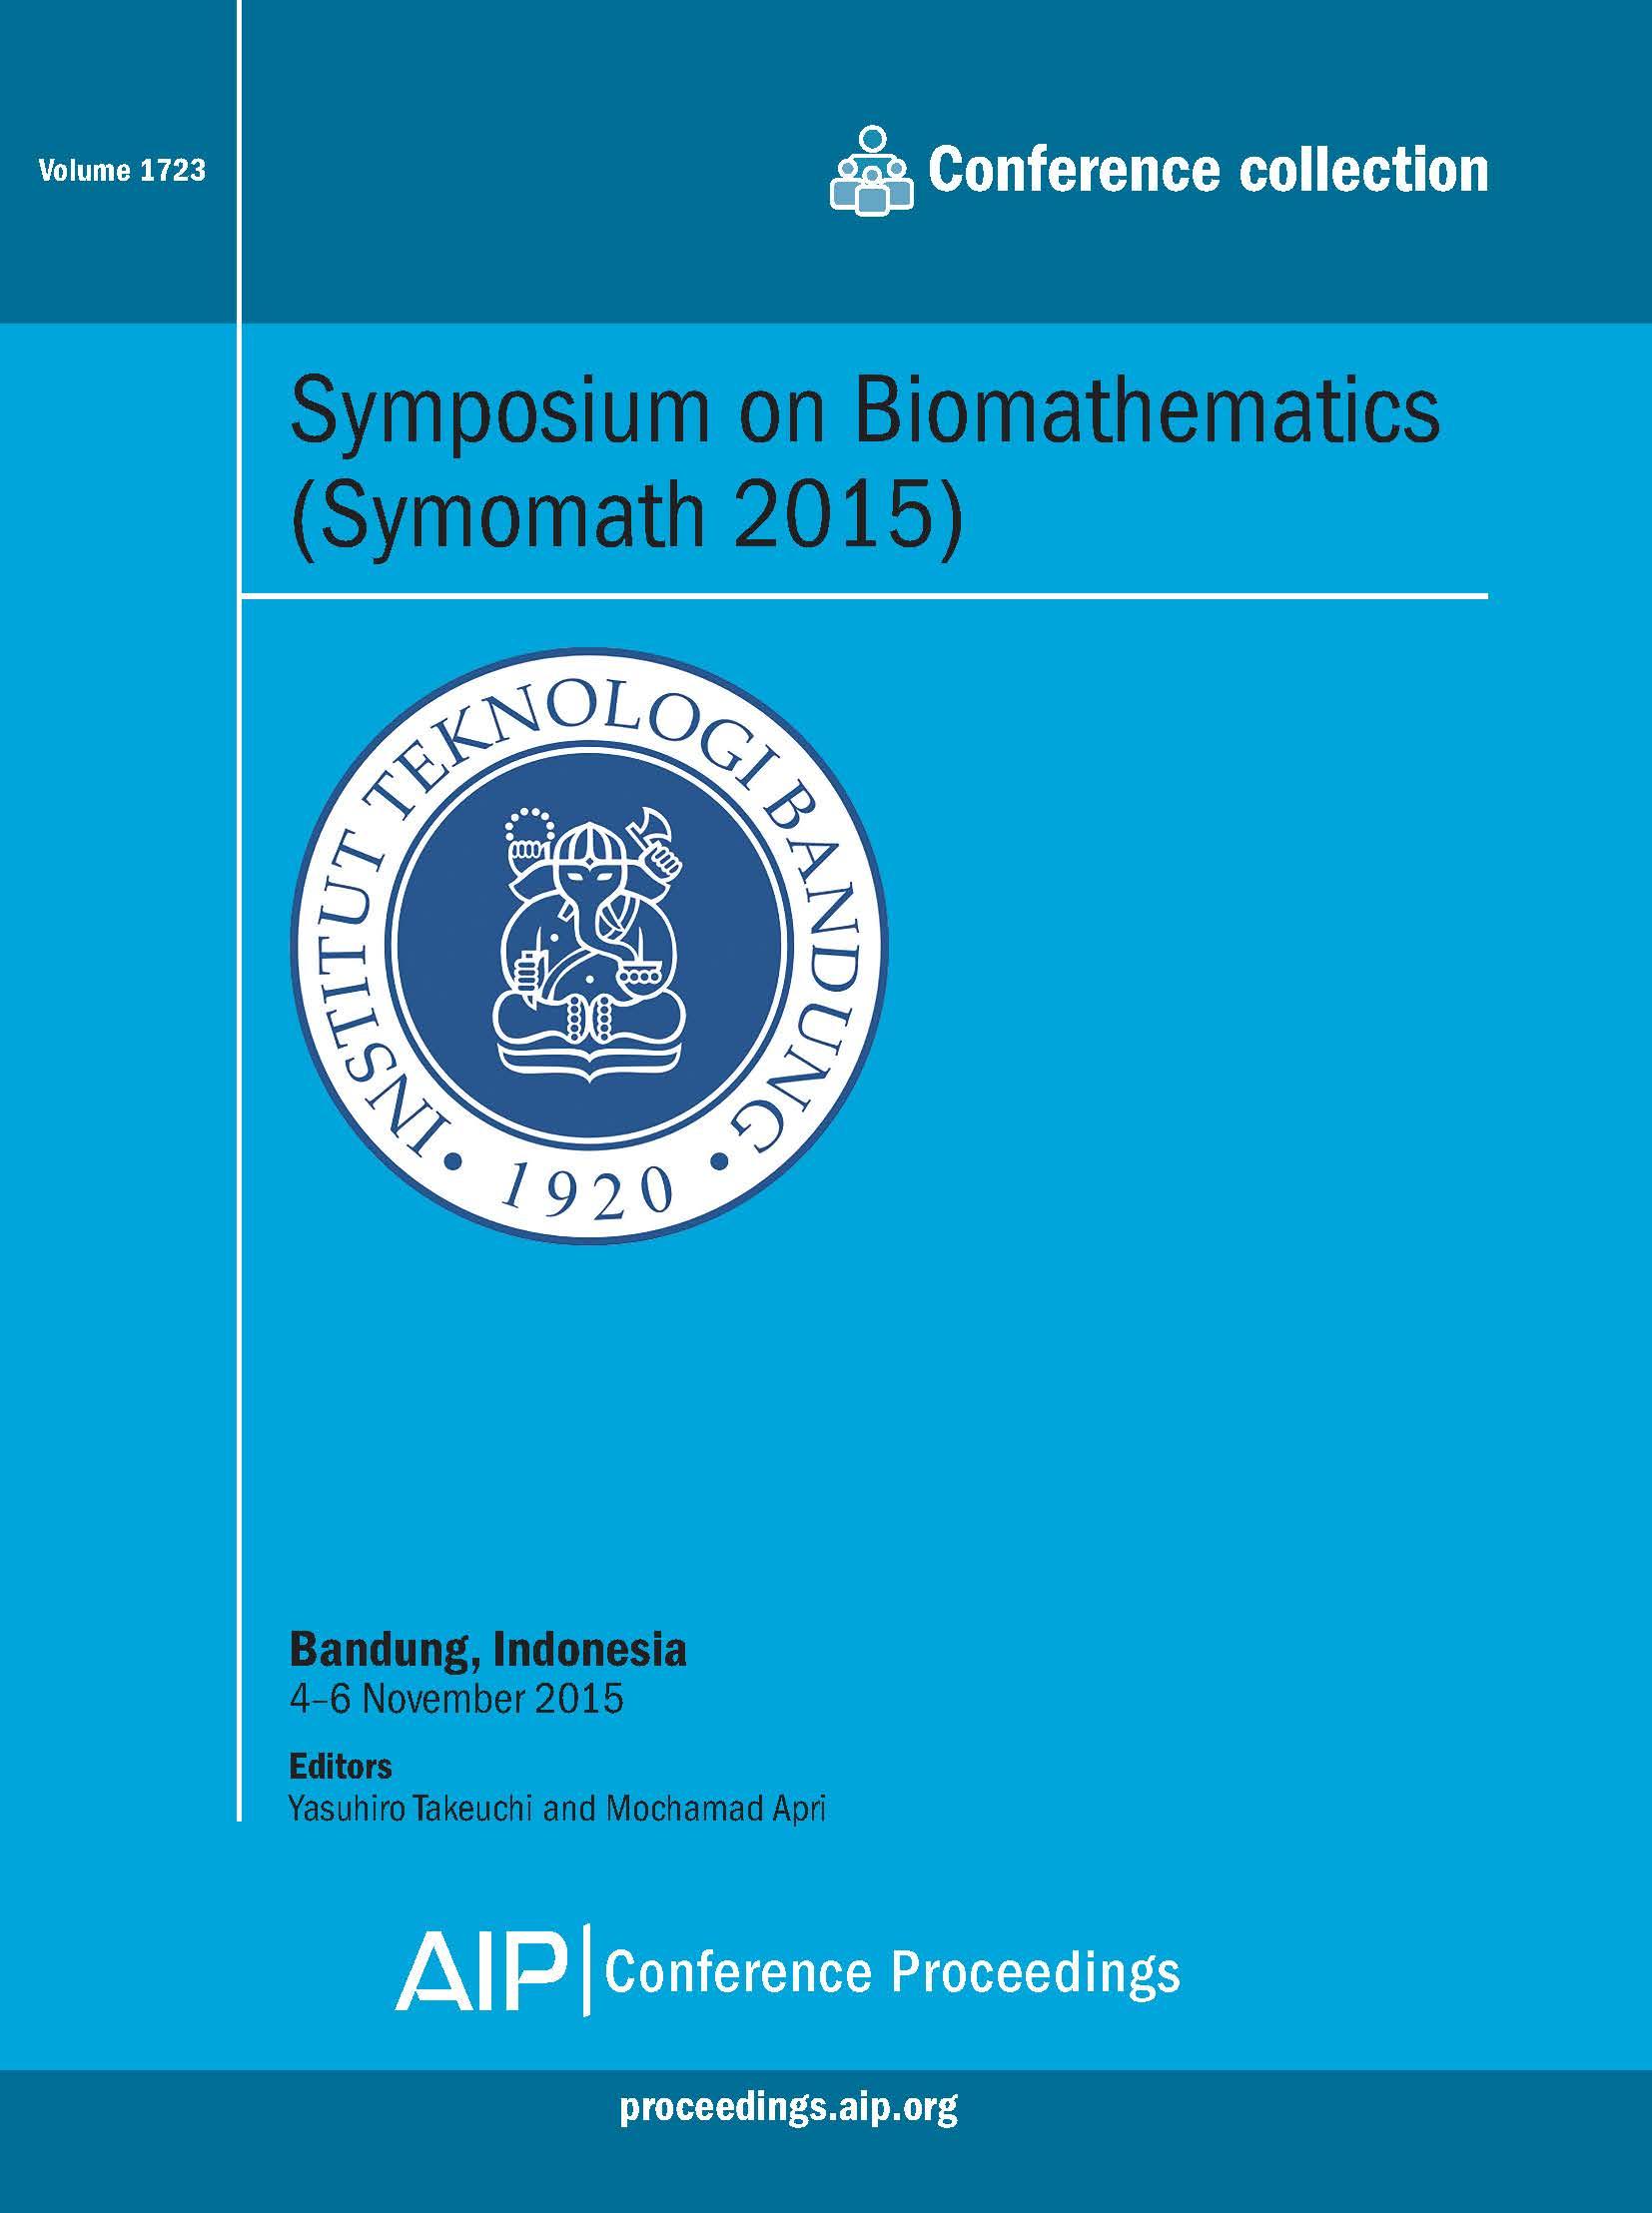 Volume 1723: Symposium on Biomathematics (Symomath 2015)   AIP